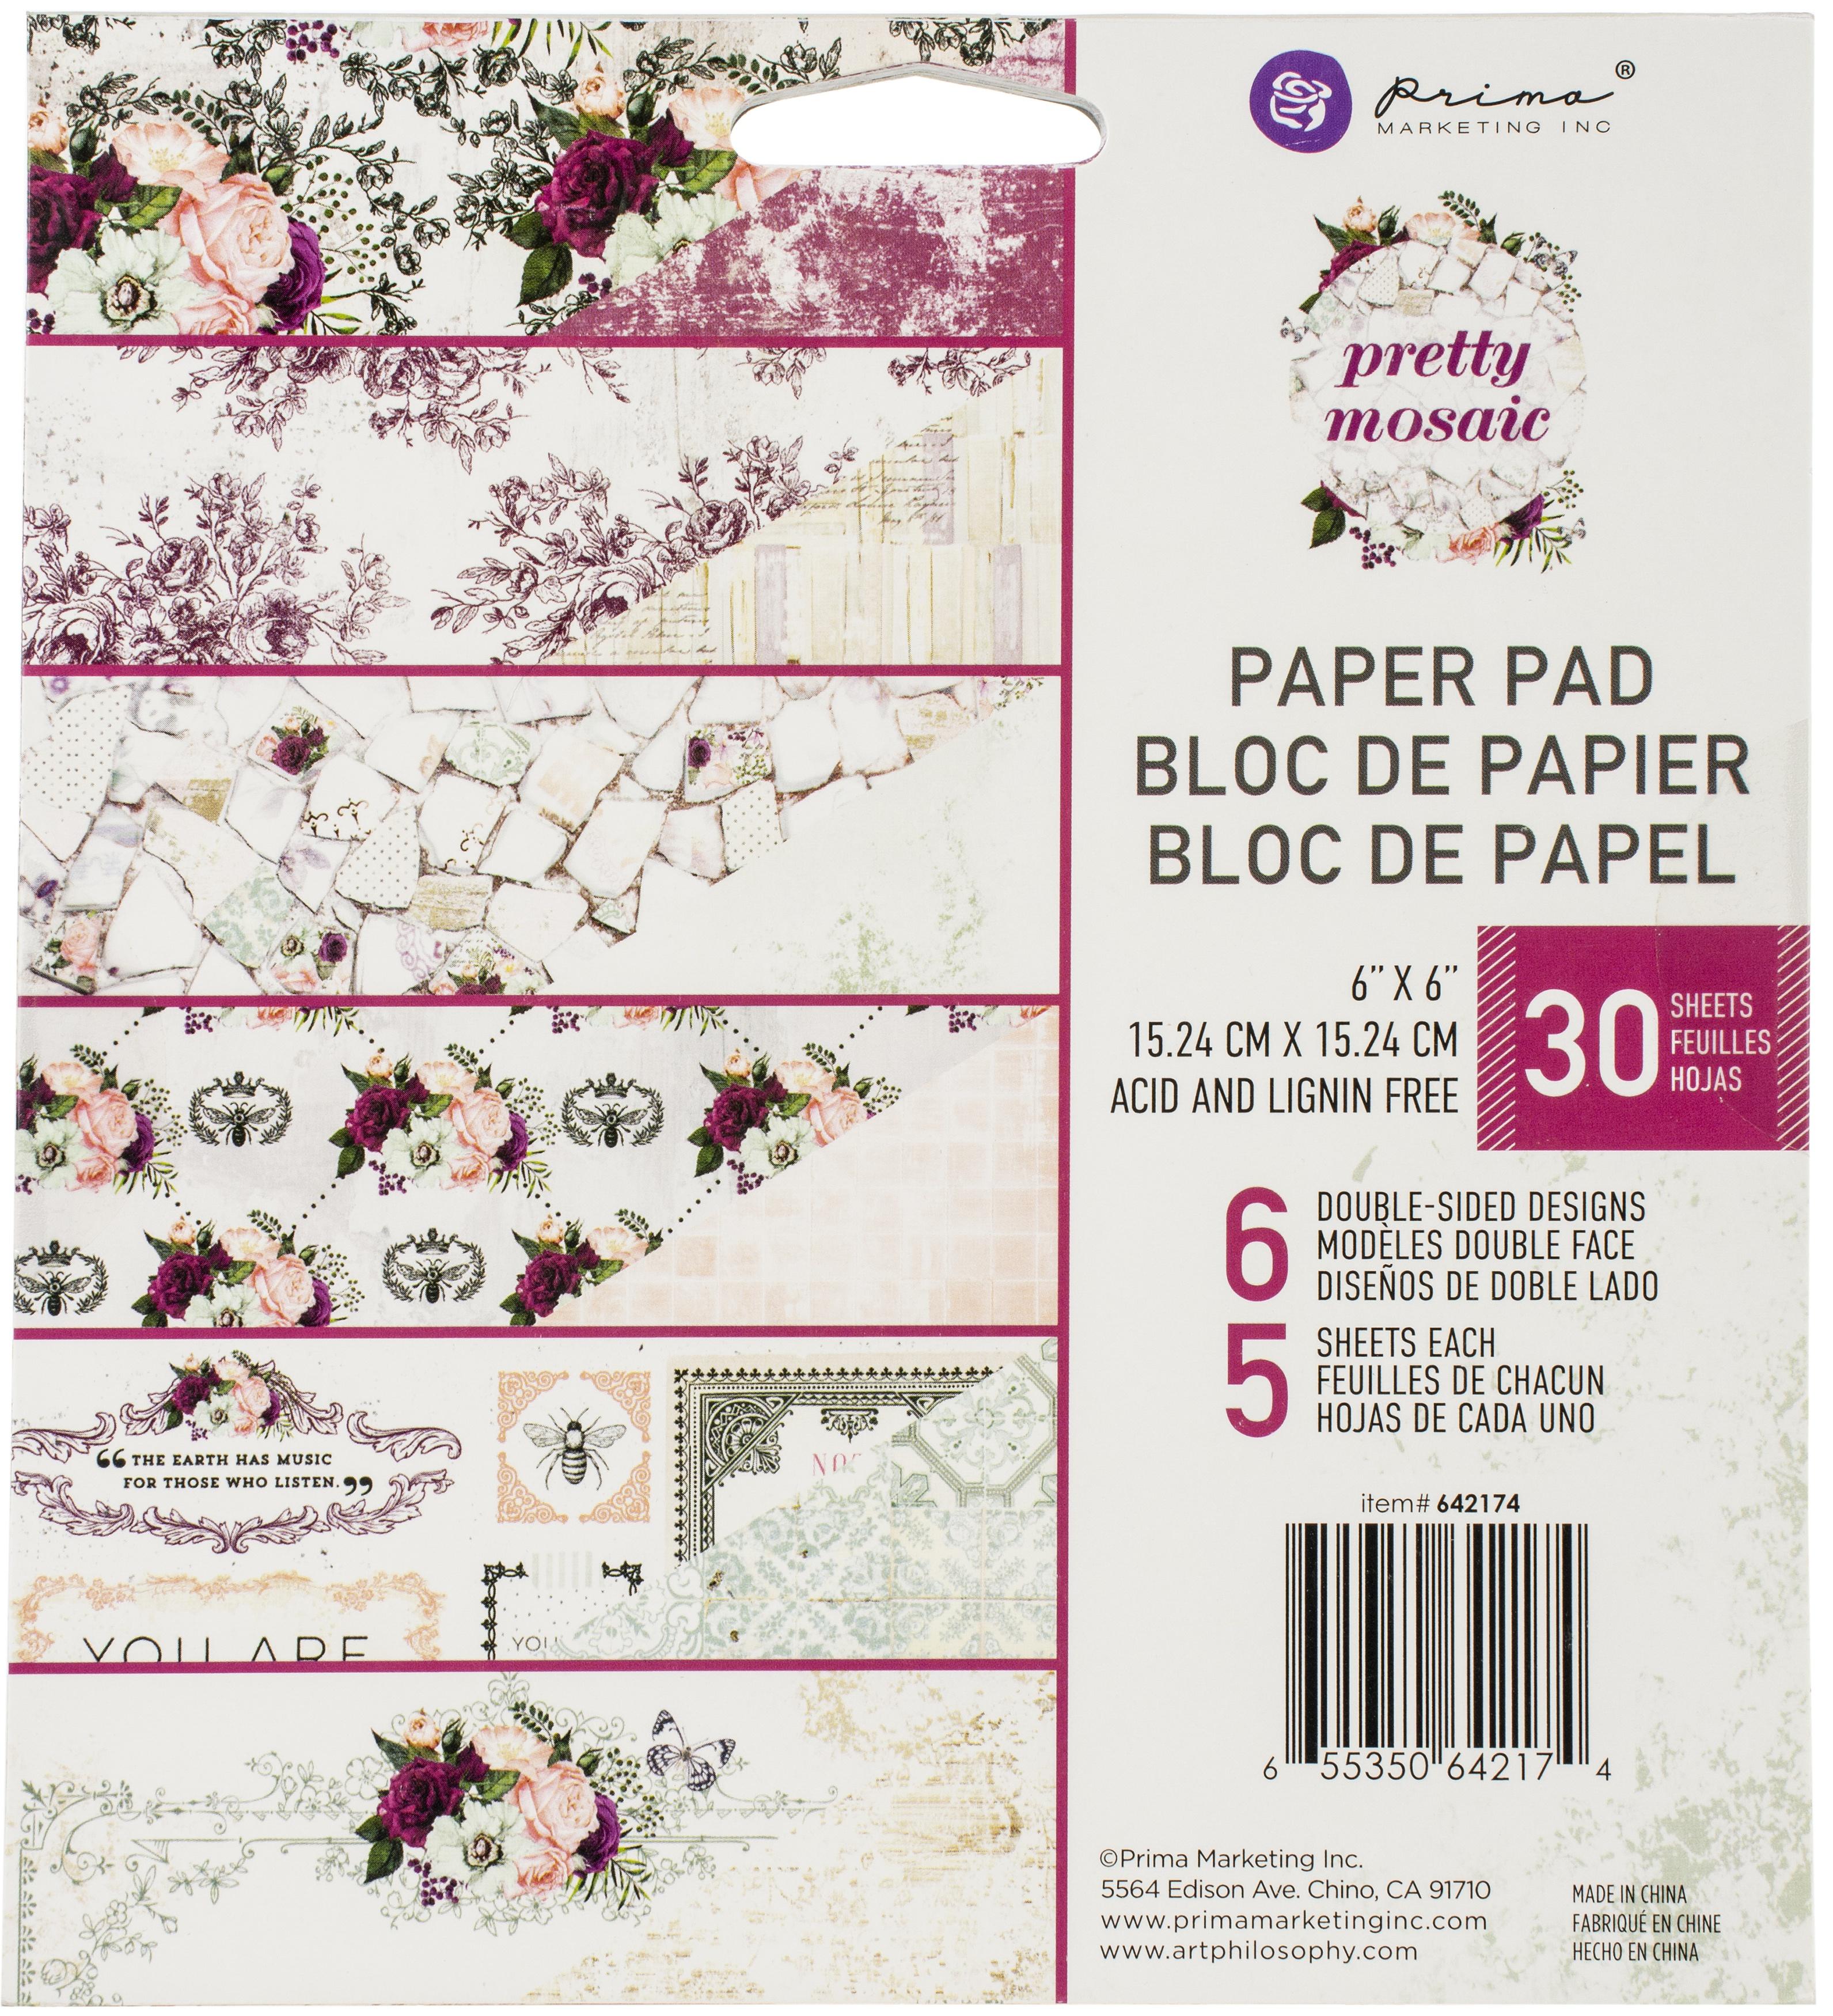 Prima Marketing Double-Sided Paper Pad 6X6 30/Pkg-Pretty Mosaic